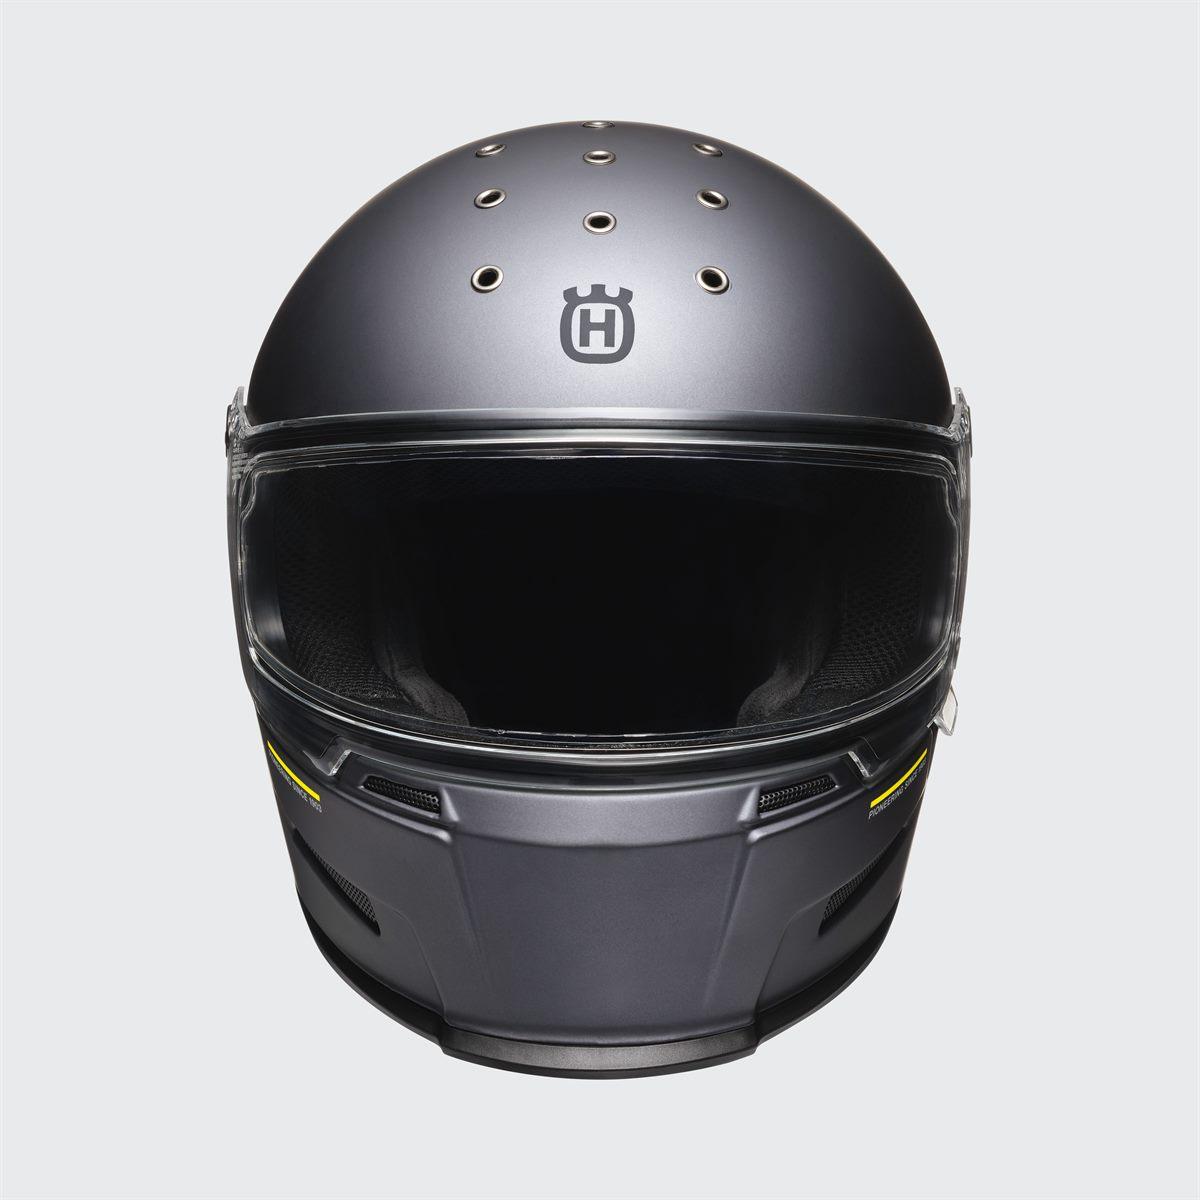 Husqvarna Motorcycles Present 2019 VITPILEN & SVARTPILEN Clothing Collection - ELIMINATOR HELMET